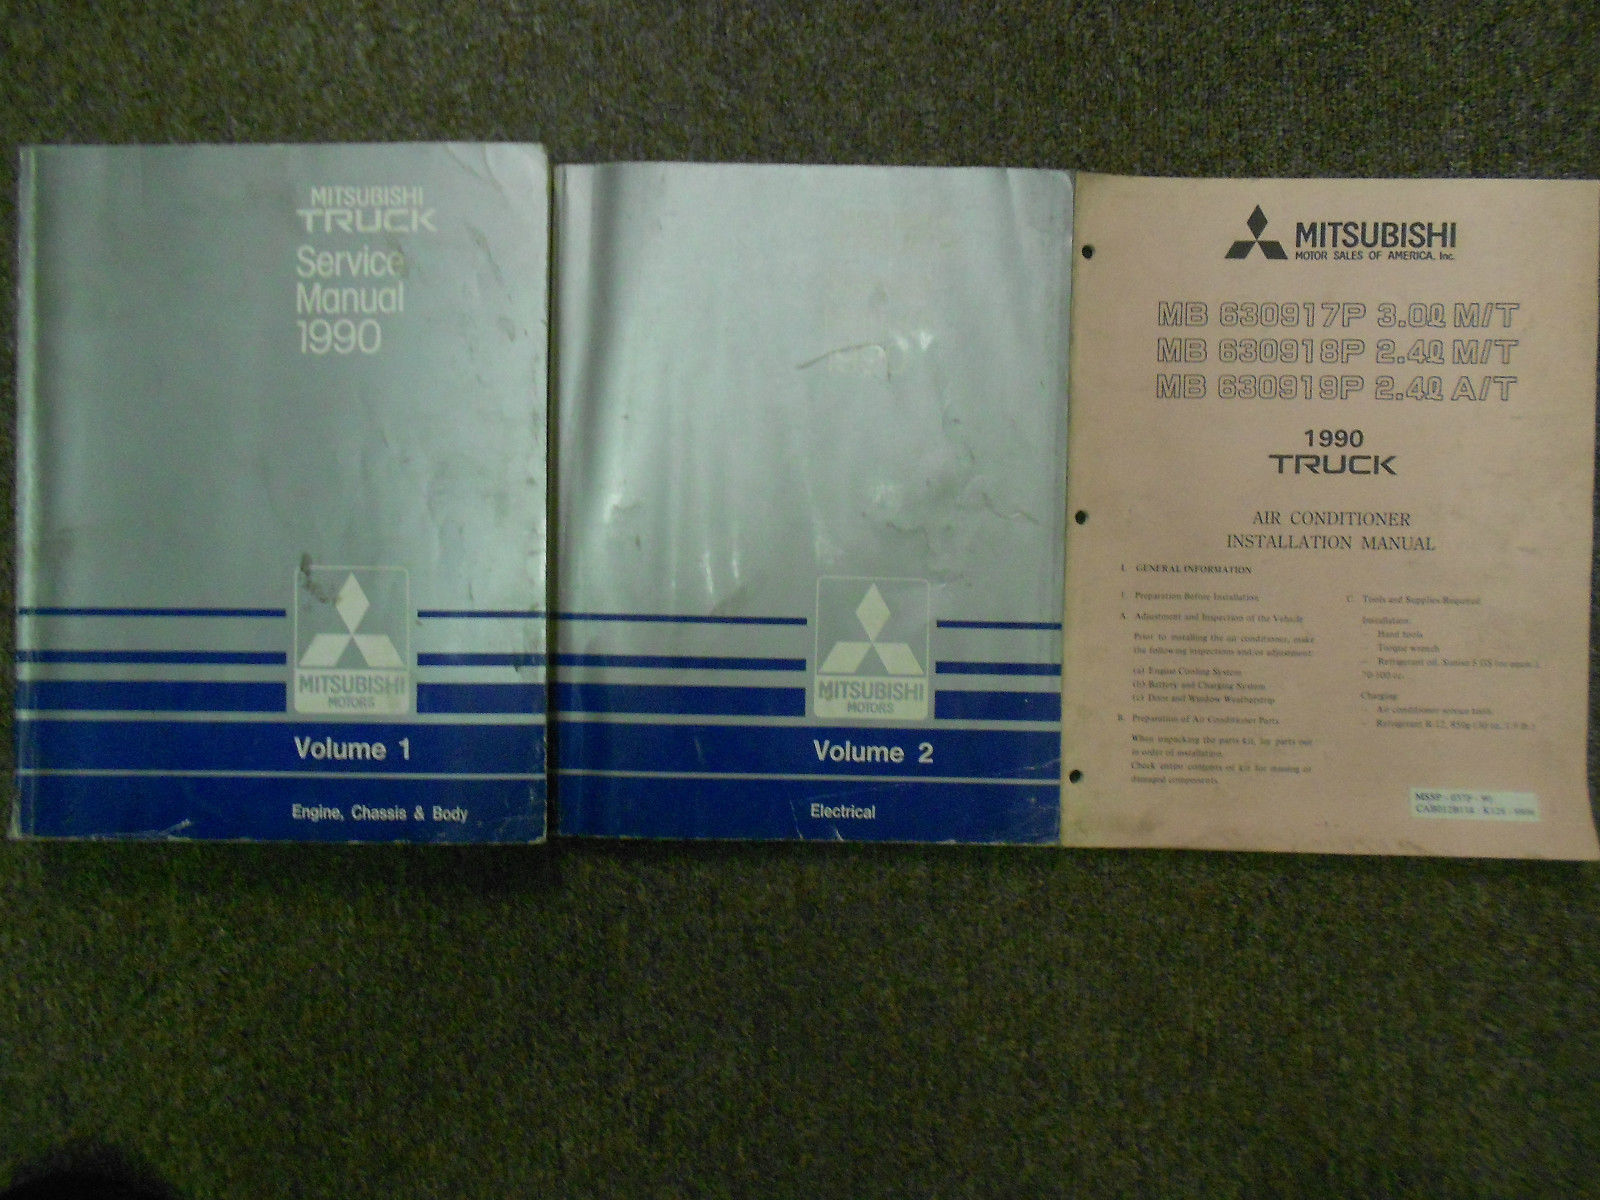 1990 MITSUBISHI Truck Service Repair Shop Manual 3 VOLUME SET FACTORY OEM 2  VOL